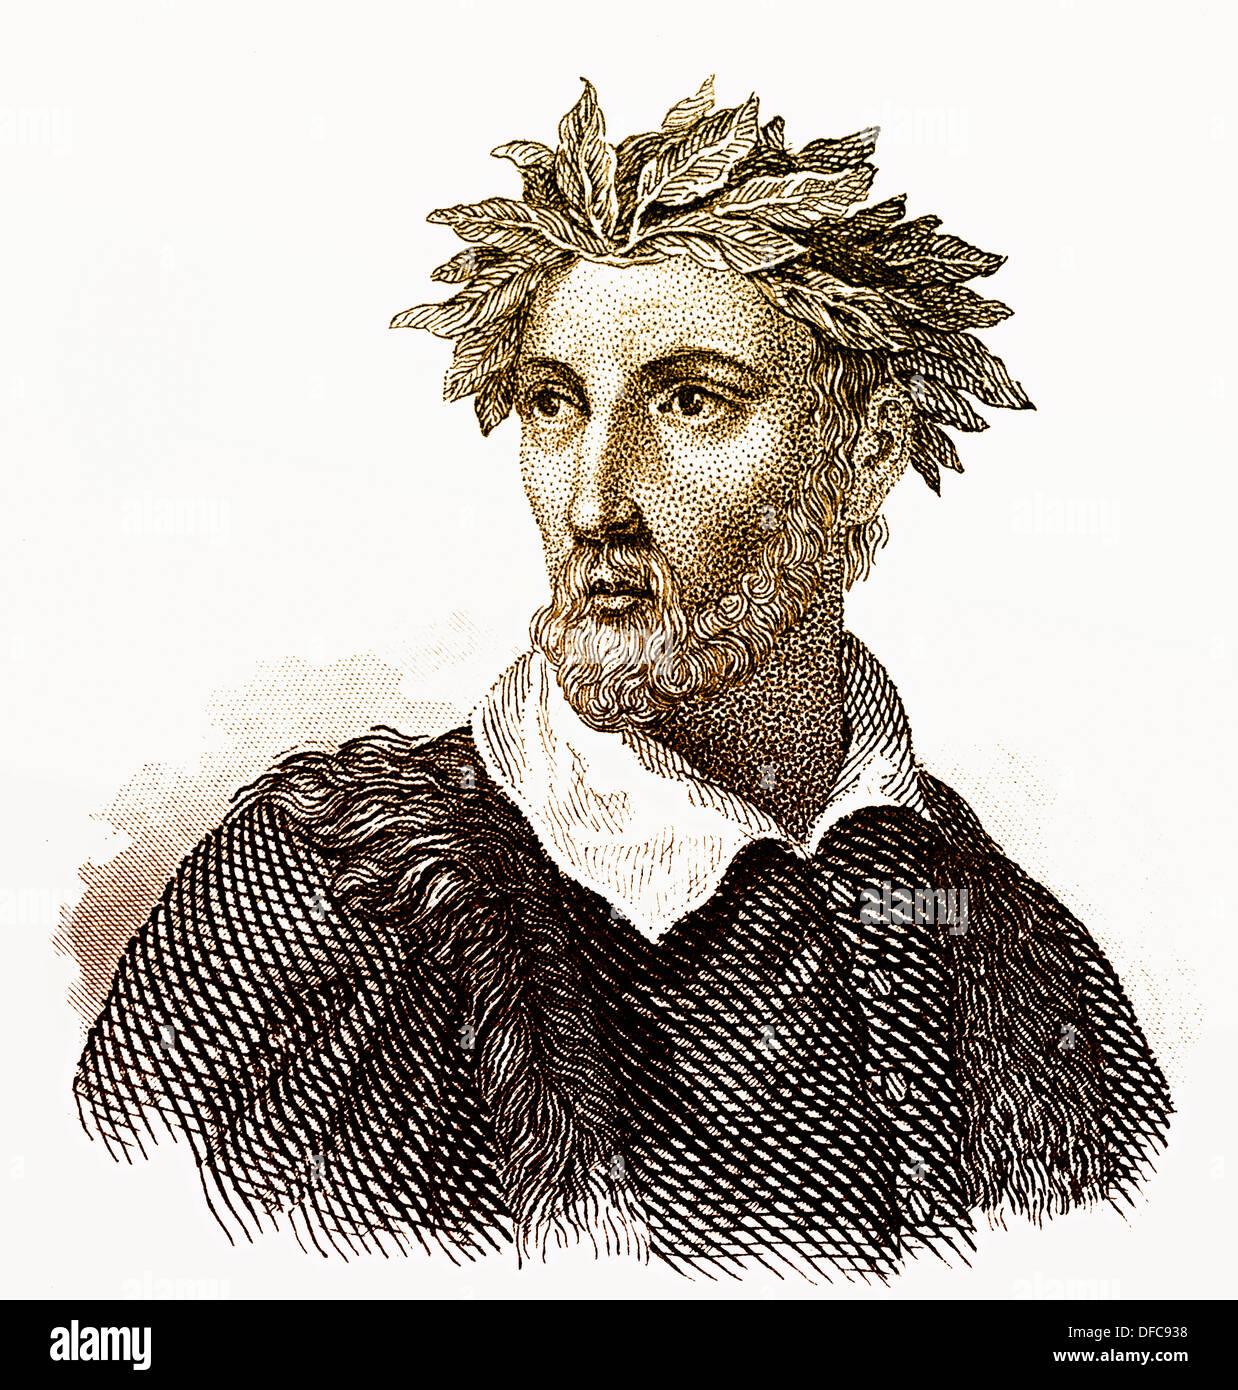 Portrait of Torquato Tasso, 1544 - 1595, an Italian poet of the Counter-Reformation - Stock Image